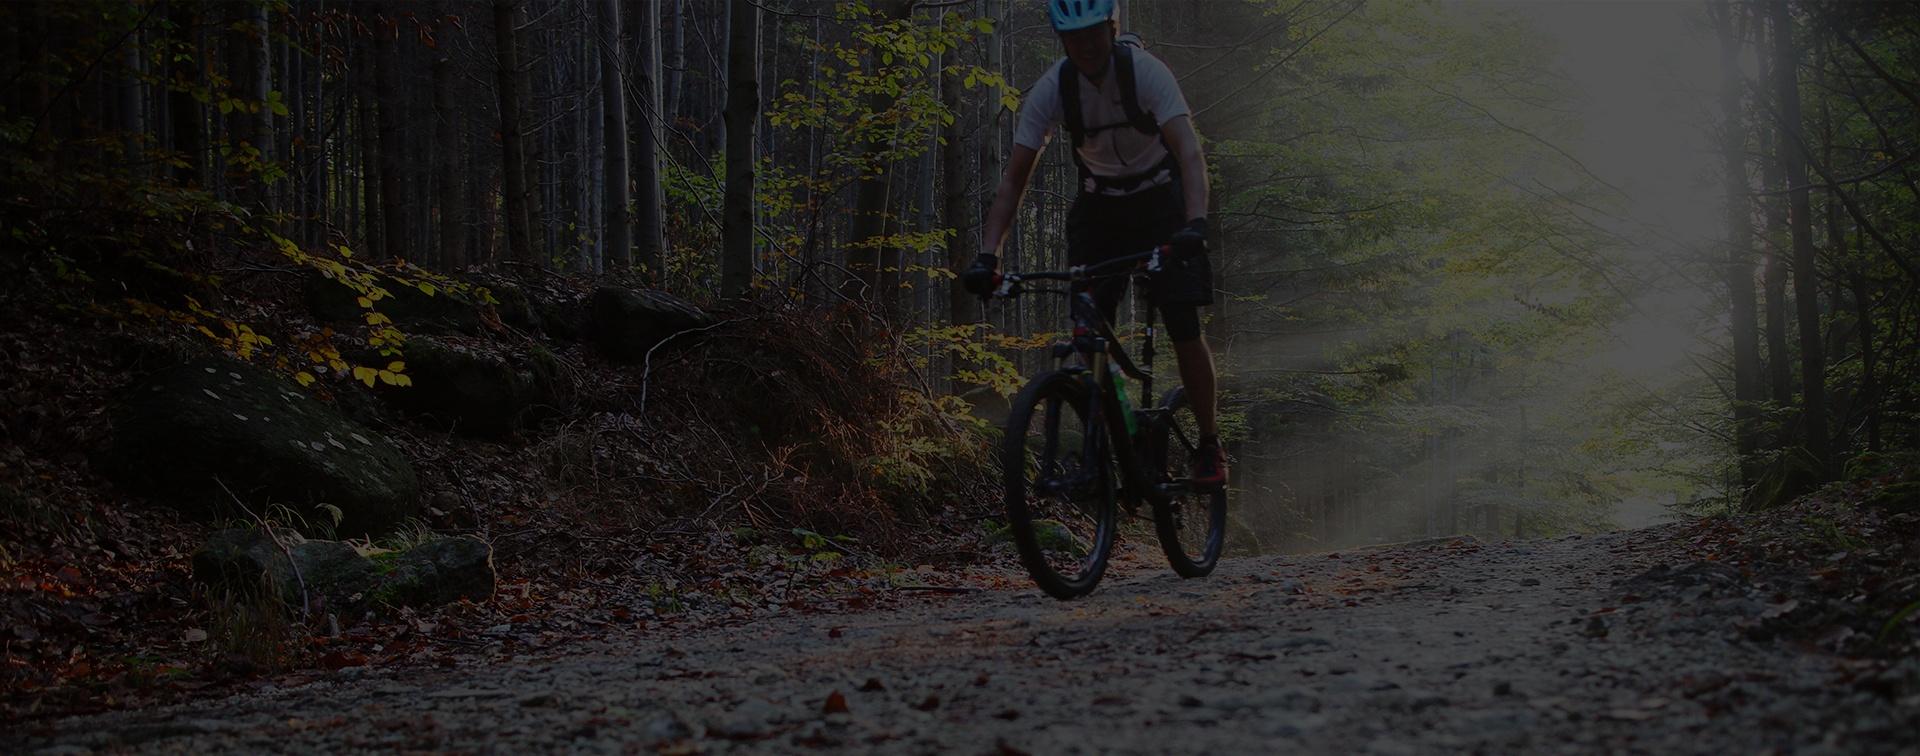 point2point_mountain_ride_description_hero.jpg